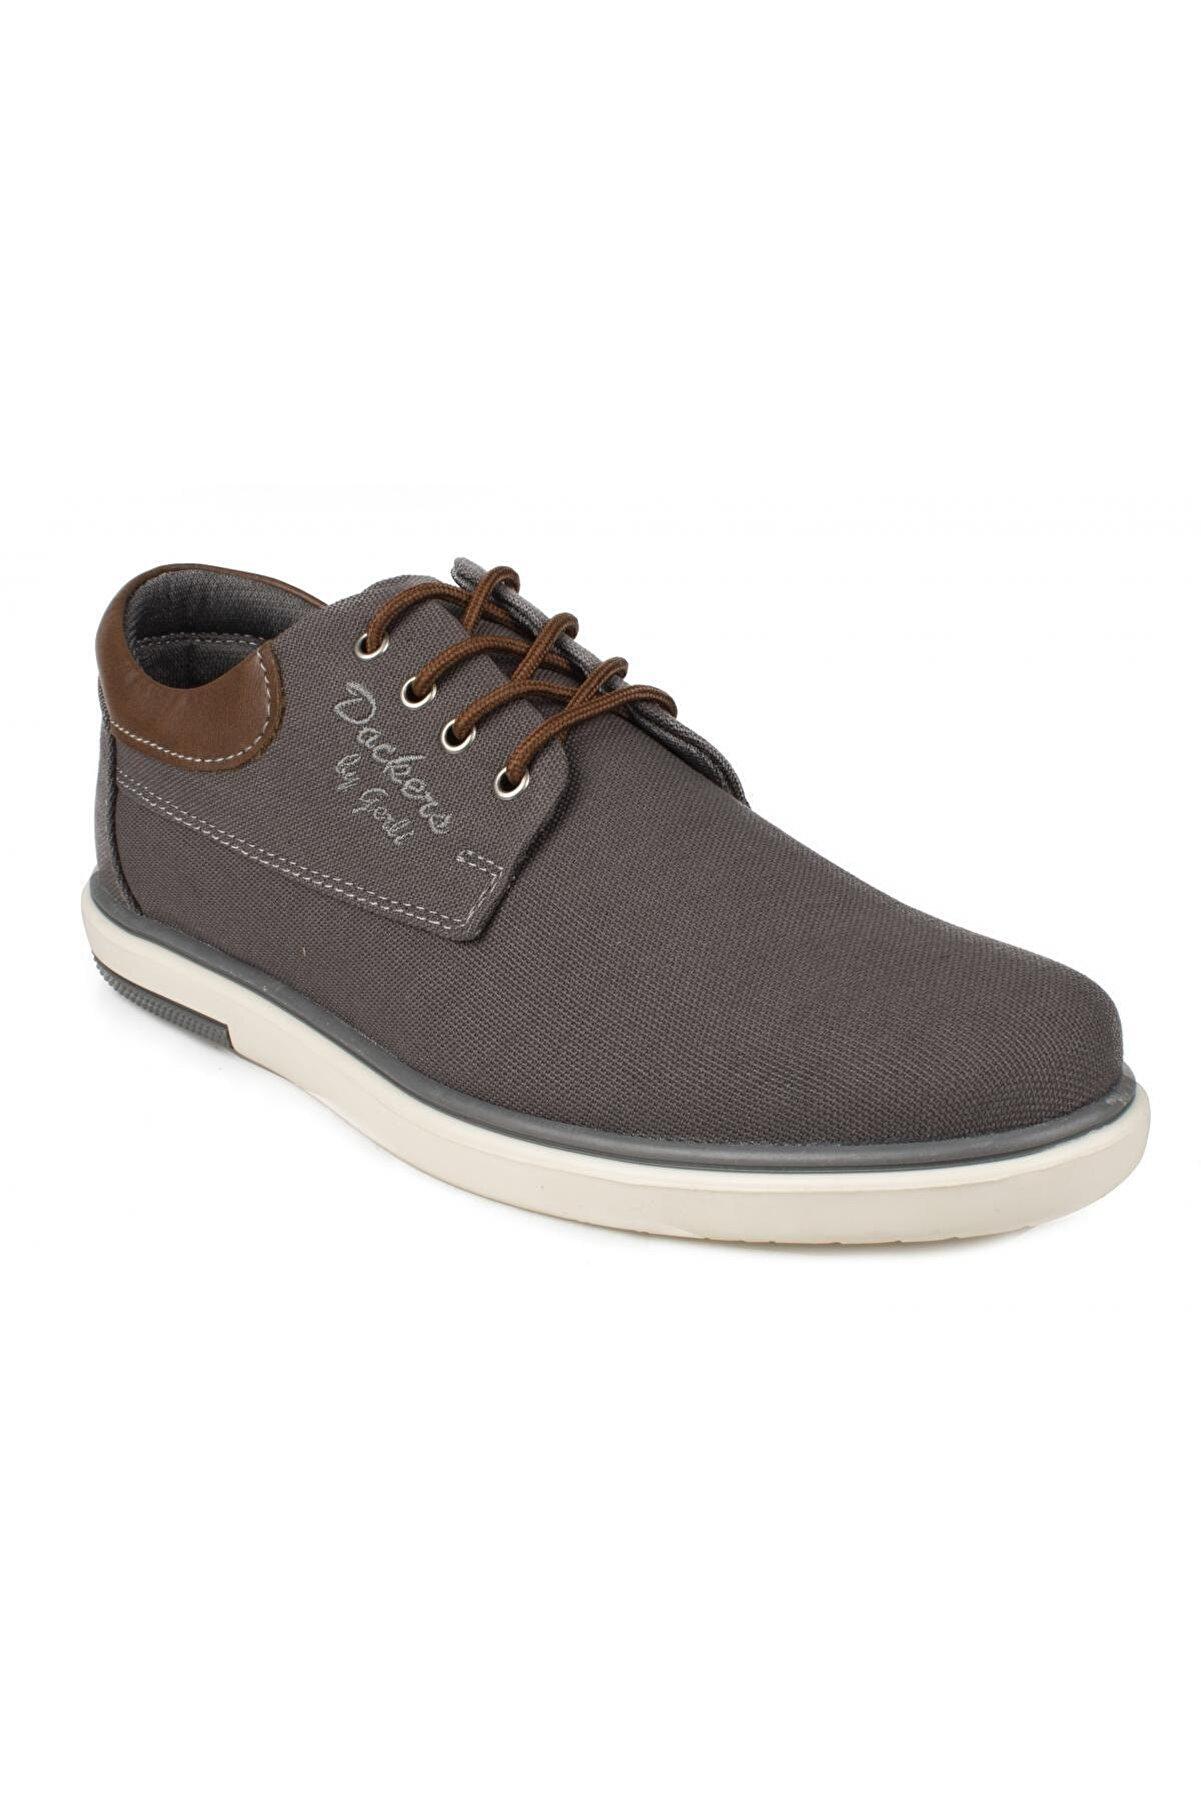 Dockers 224942 1FX Gri Erkek Sneaker Ayakkabı 100781226